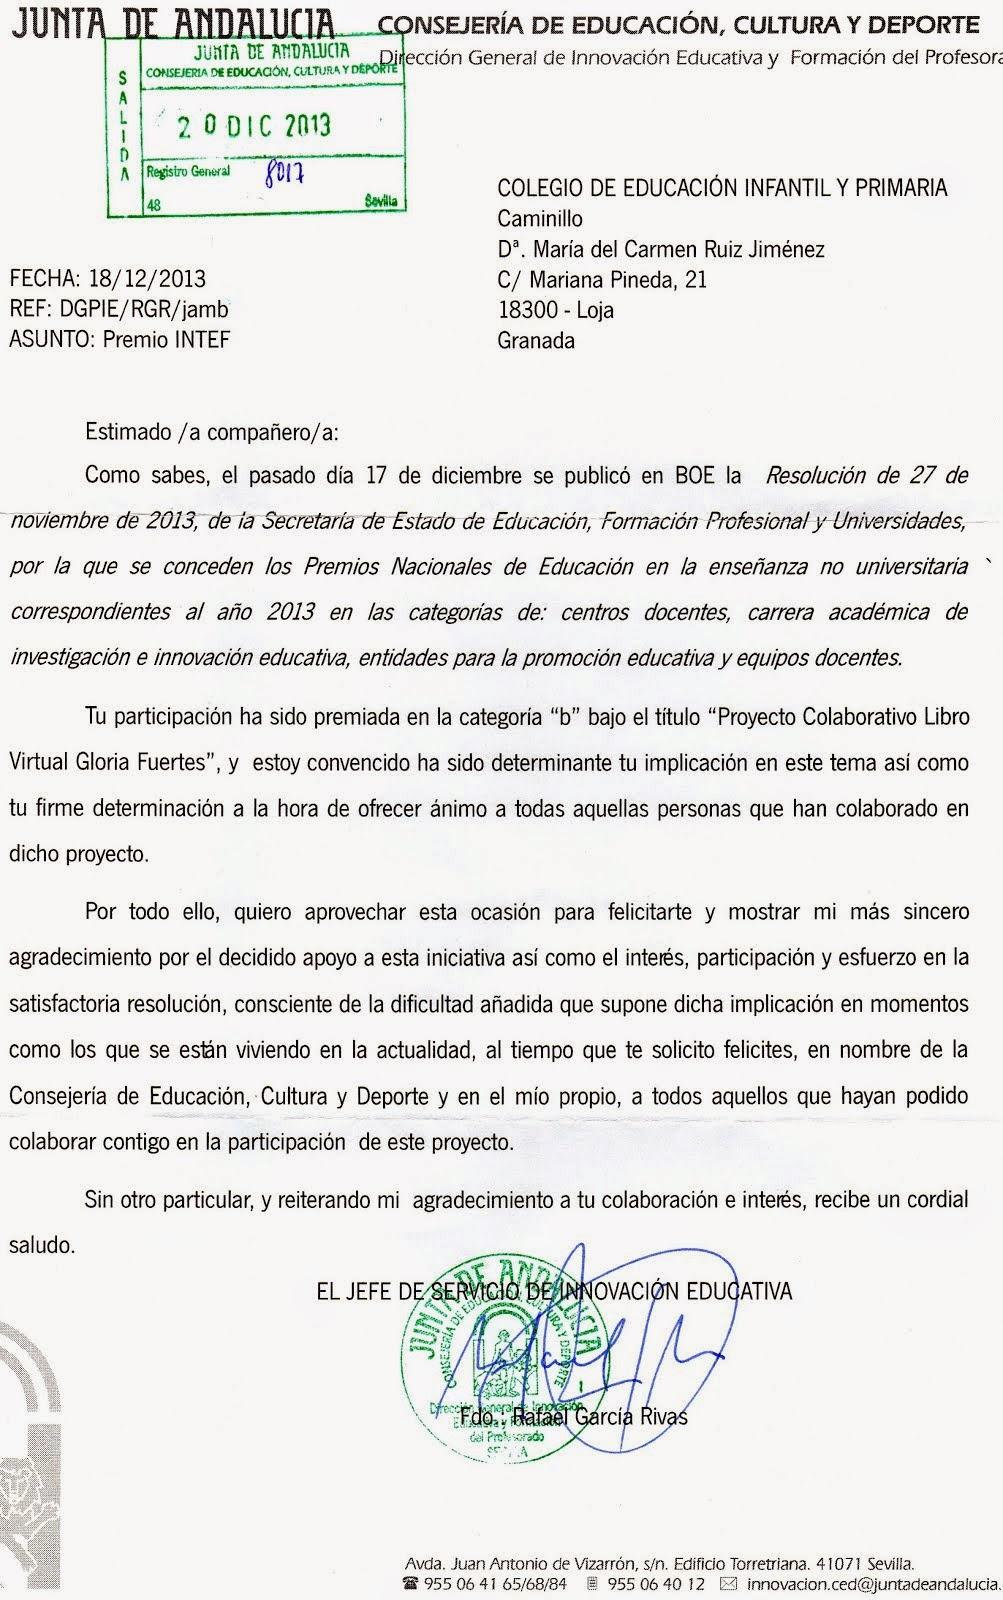 Felicitación de la Delegada Ana Gámez Tapias